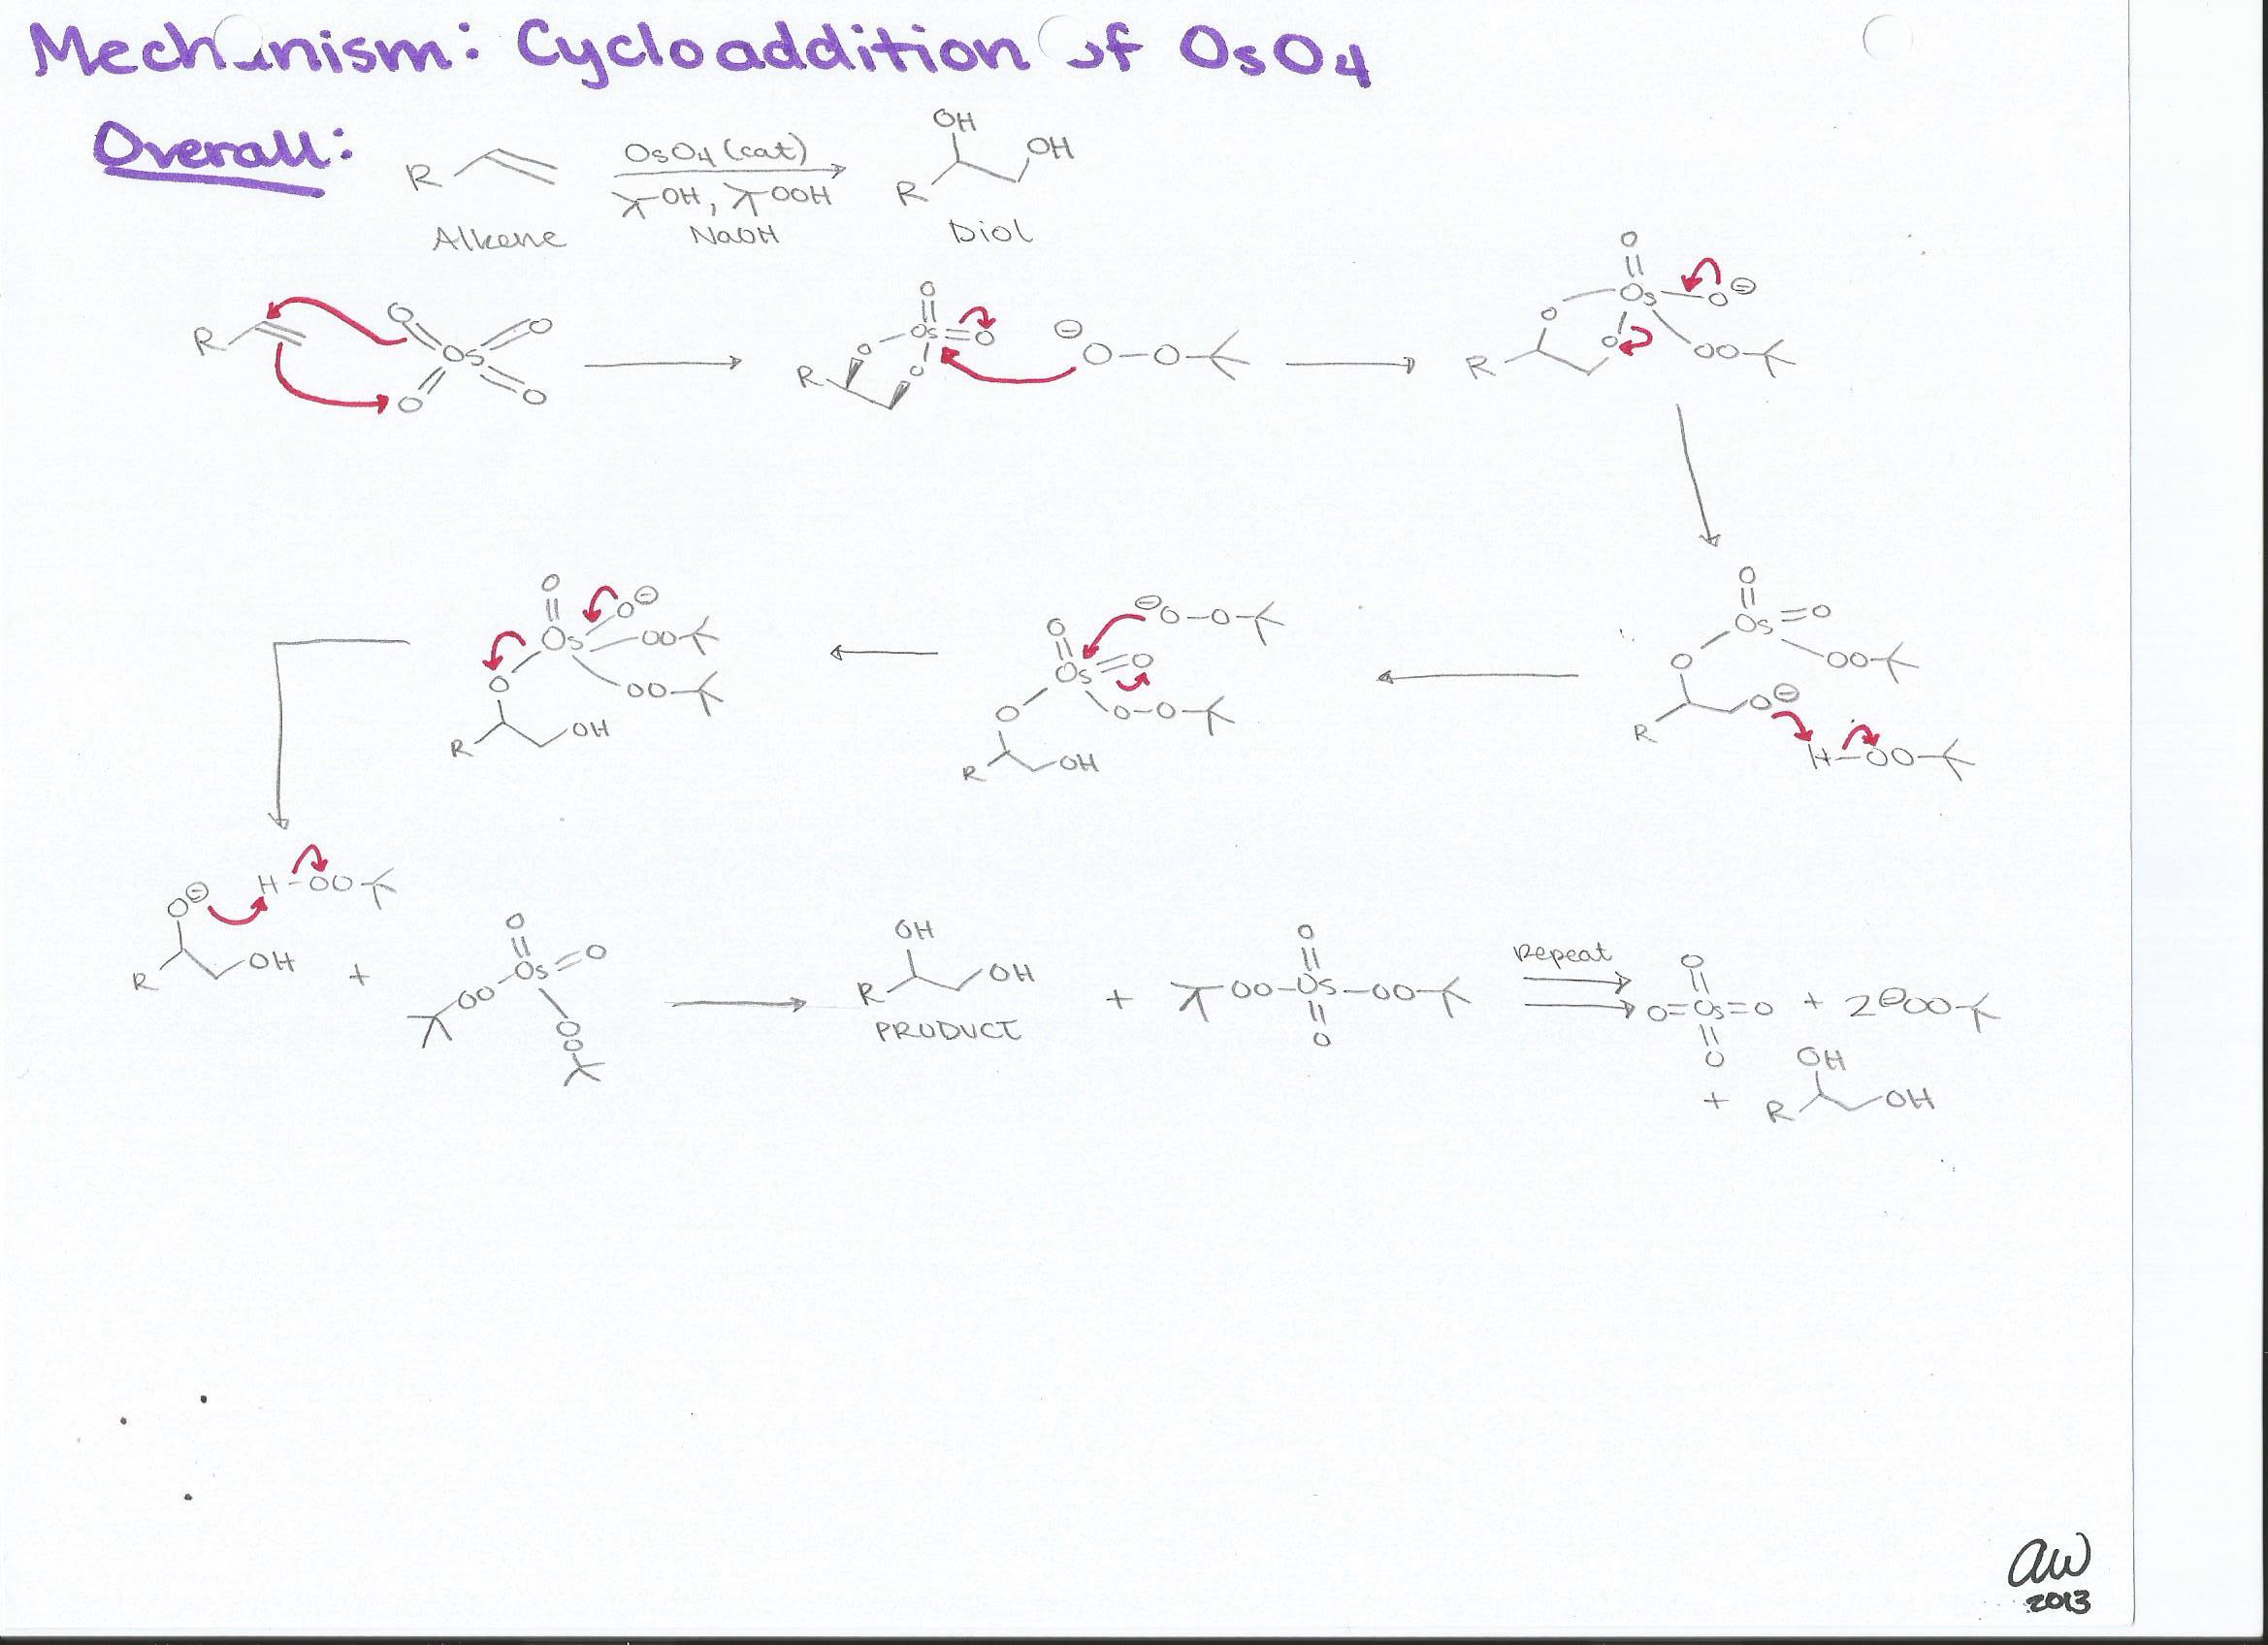 Cycloaddition of Osmium Tetroxide